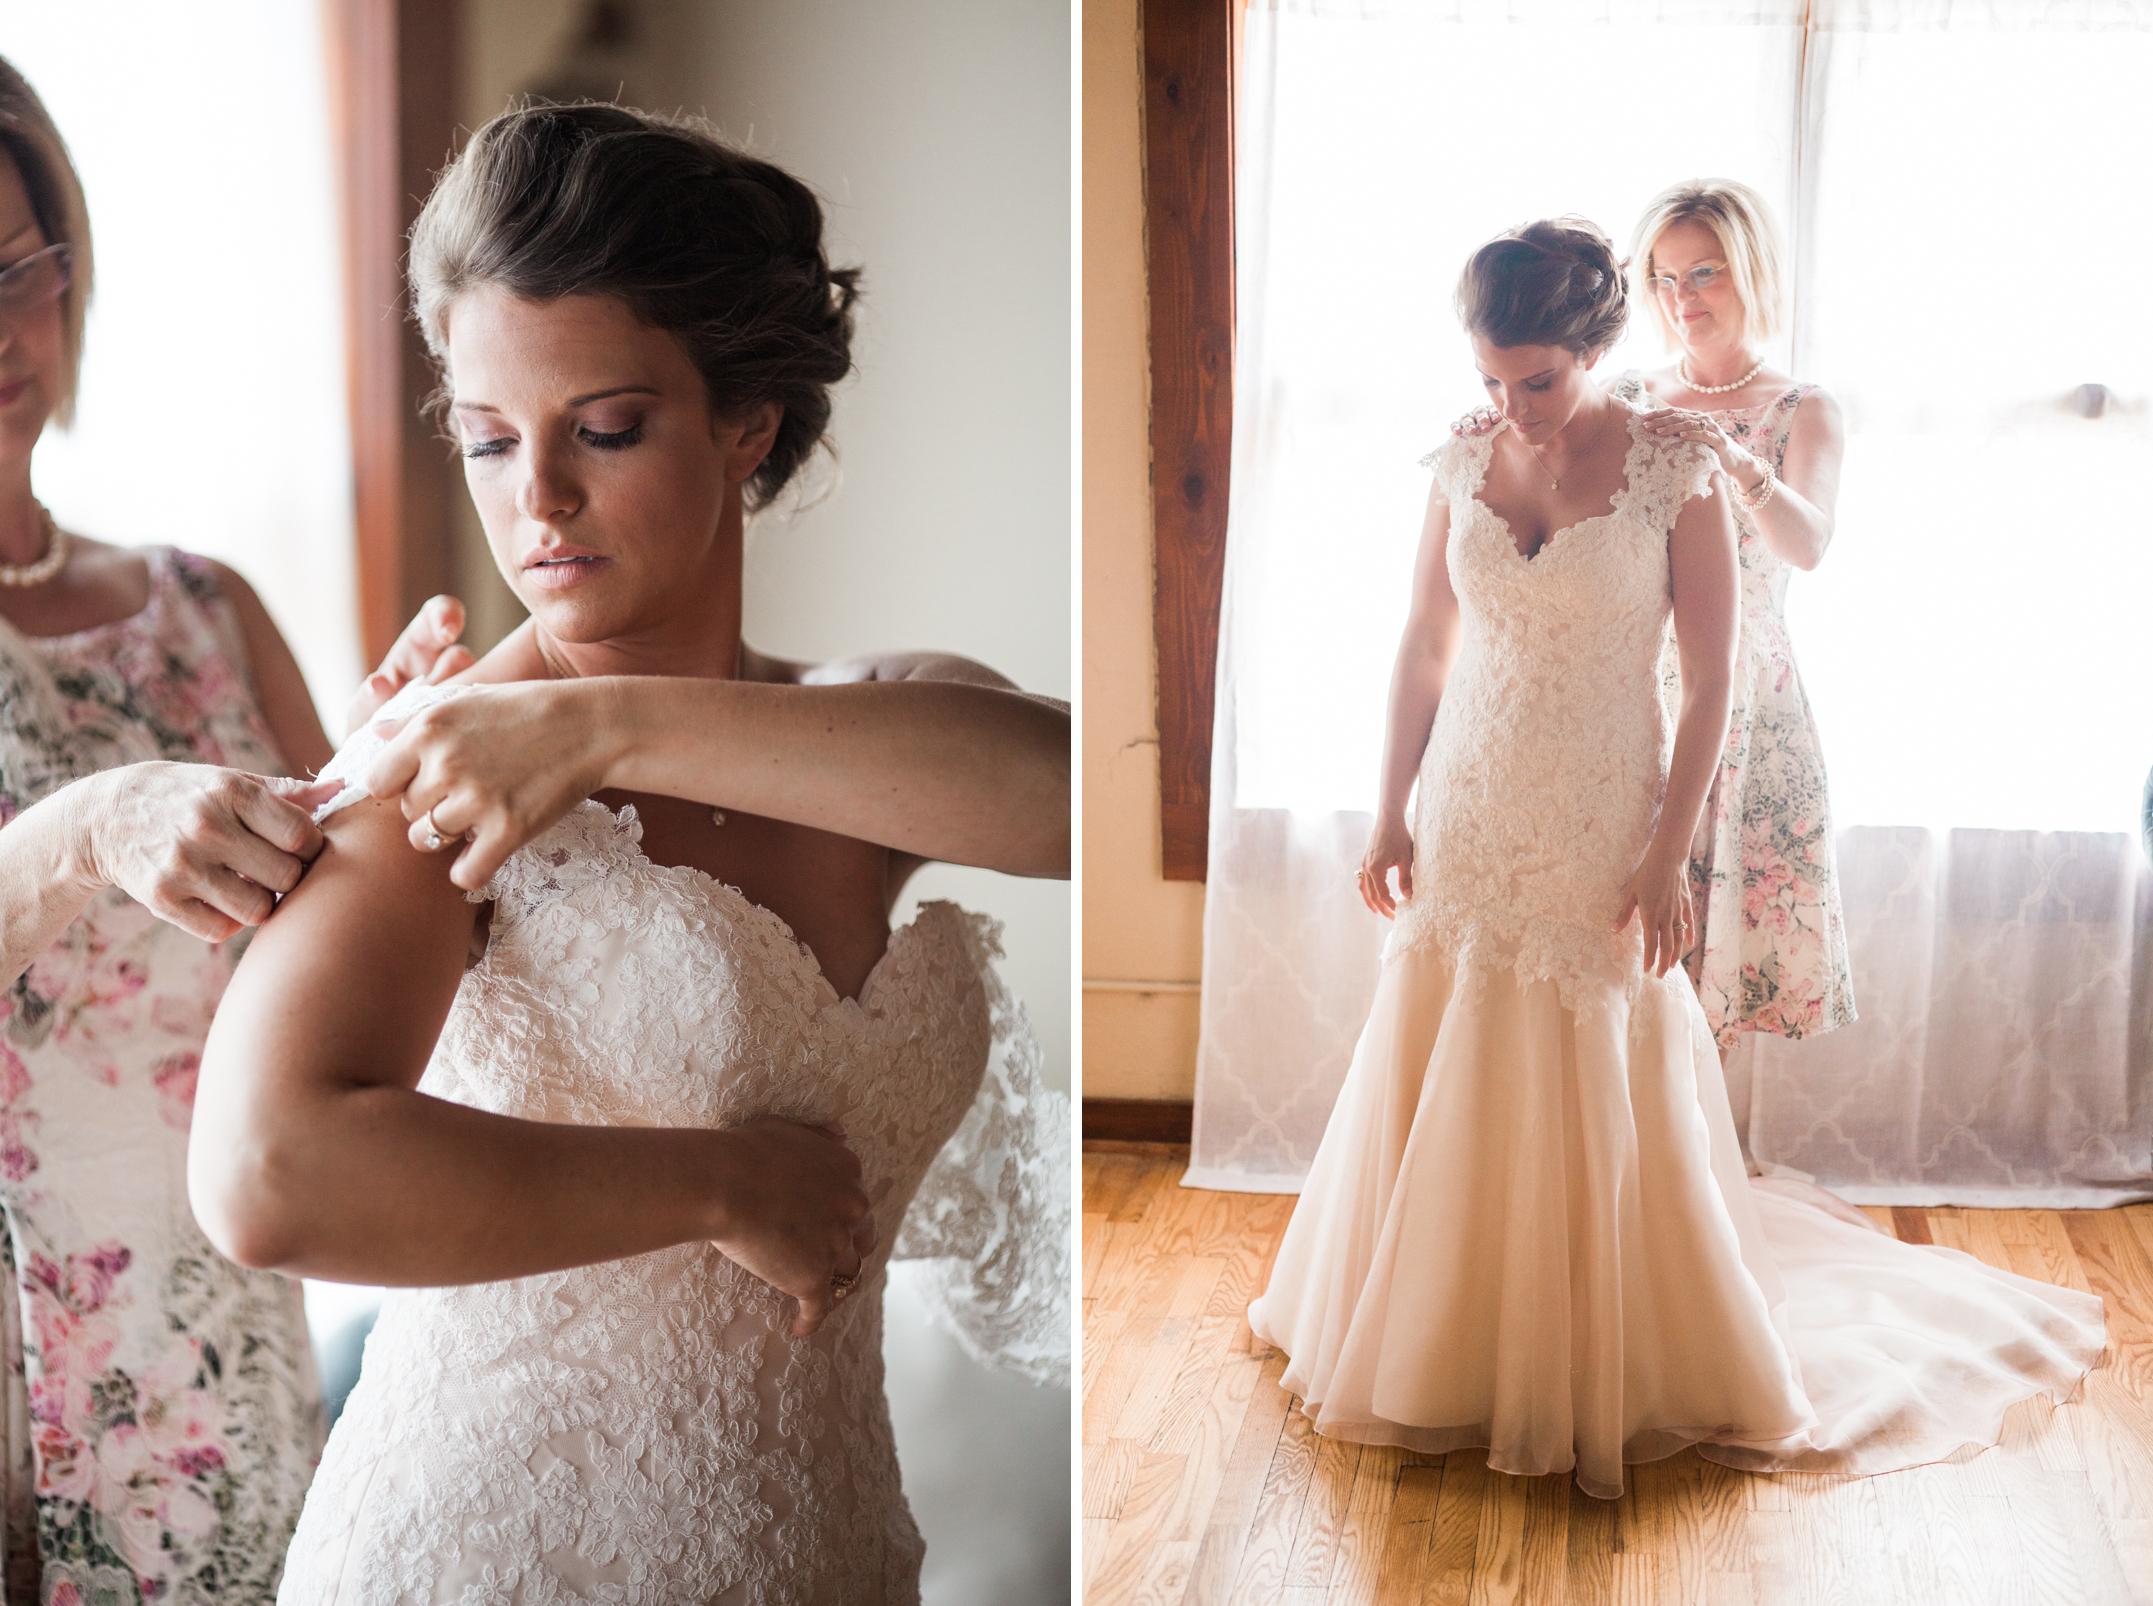 LegacyUnion-Wedding-Photographer-Glendale-CA-123 copy.jpg